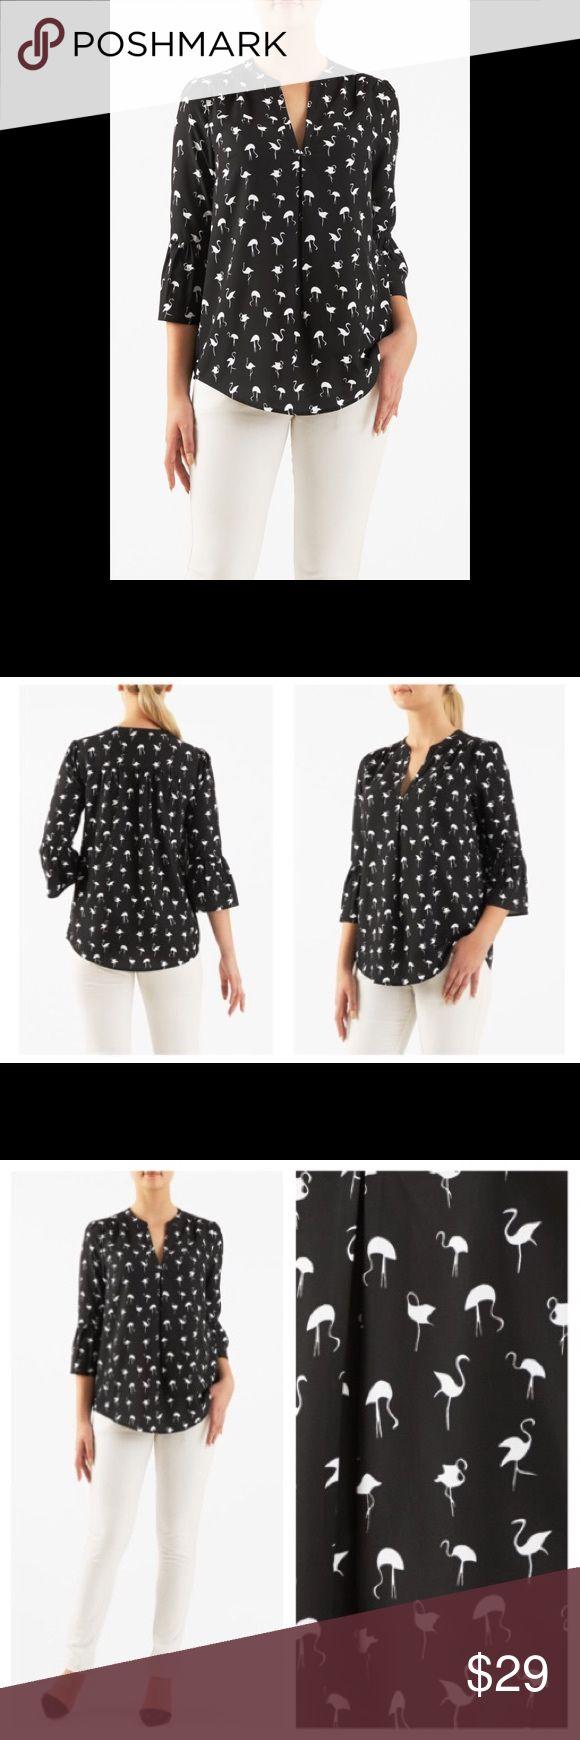 "New Eshakti Flamingo top blouse 18W New Eshakti flamingo top blouse 18W Measured flat: Underarm to underarm: 45"" Waist: 46"" Length: 29-33"" Sleeve: 14 1/2"" Eshakti size guide for 18W bust: 45"" banded split neck, bell sleeves, center pleat for relaxed silhouette. Shirttail hem, rushed pleat back yoke. Polyester, woven crepe, easy drape, no stretch, lightweight. Machine wash. New w/cut out Eshakti tag to prevent returning to Eshakti eshakti Tops Blouses"